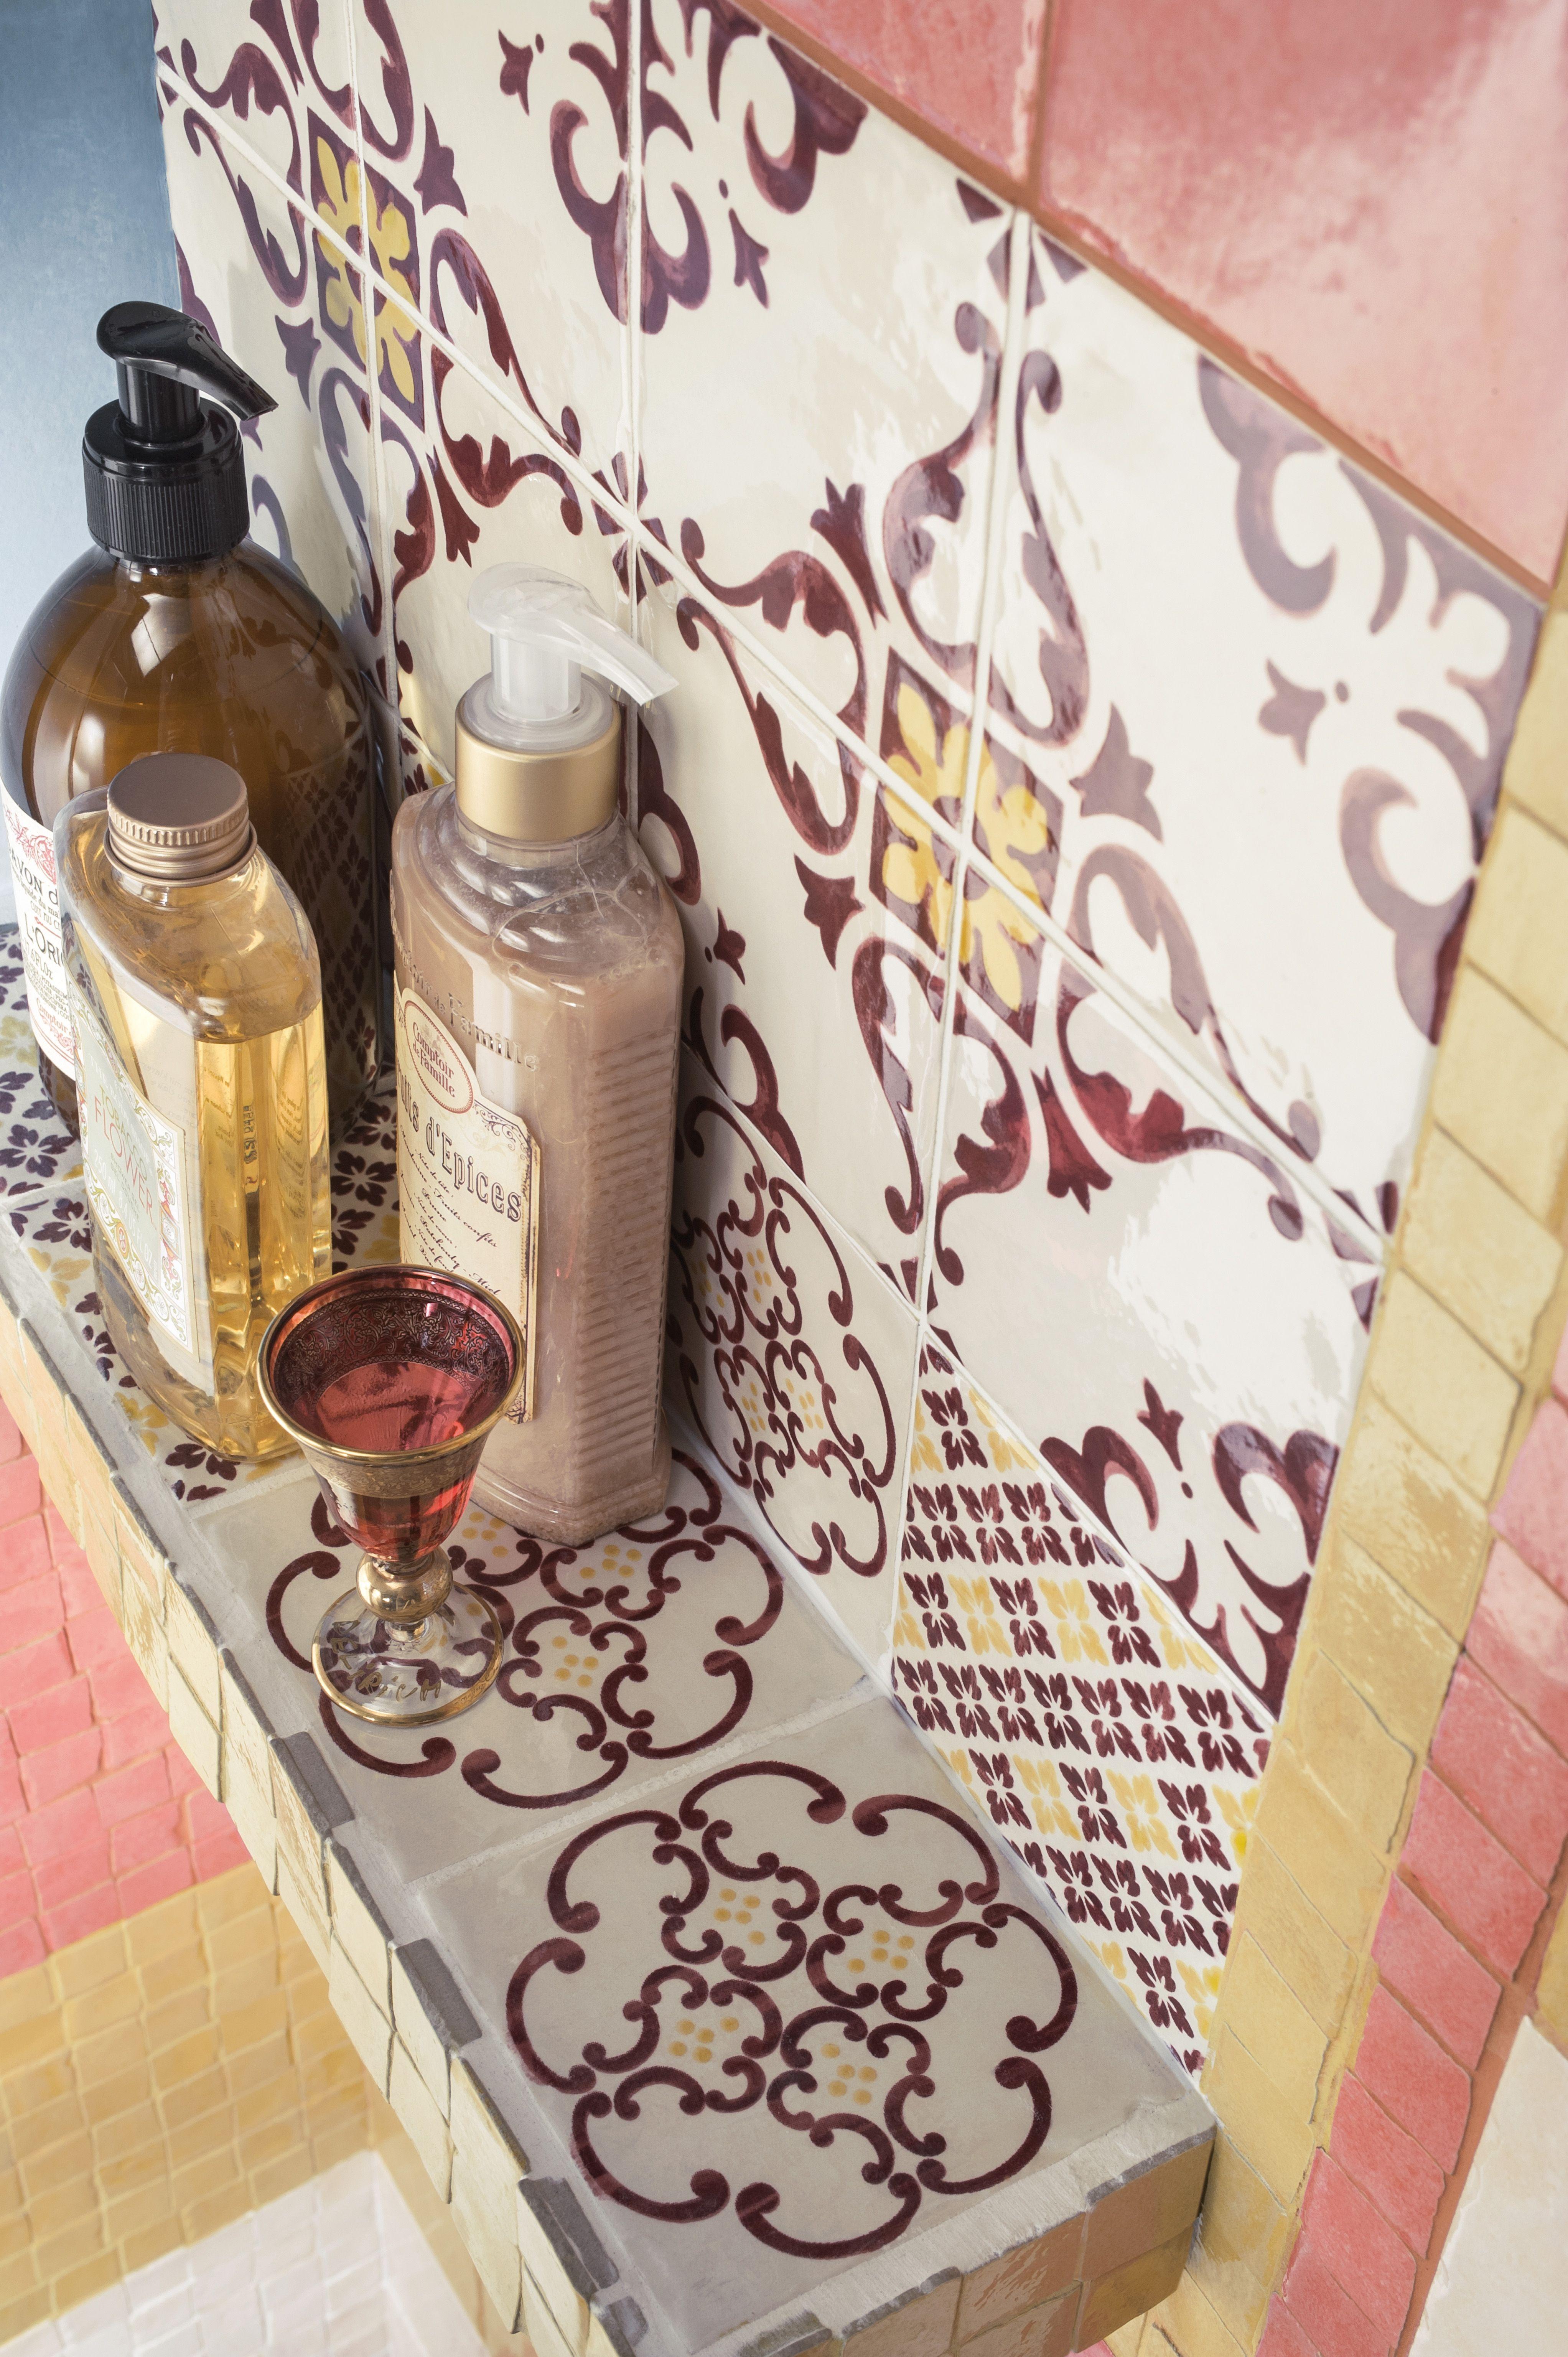 Jolie Collection #maiolica #color #vintage #oldstyle #tradition #bathroom